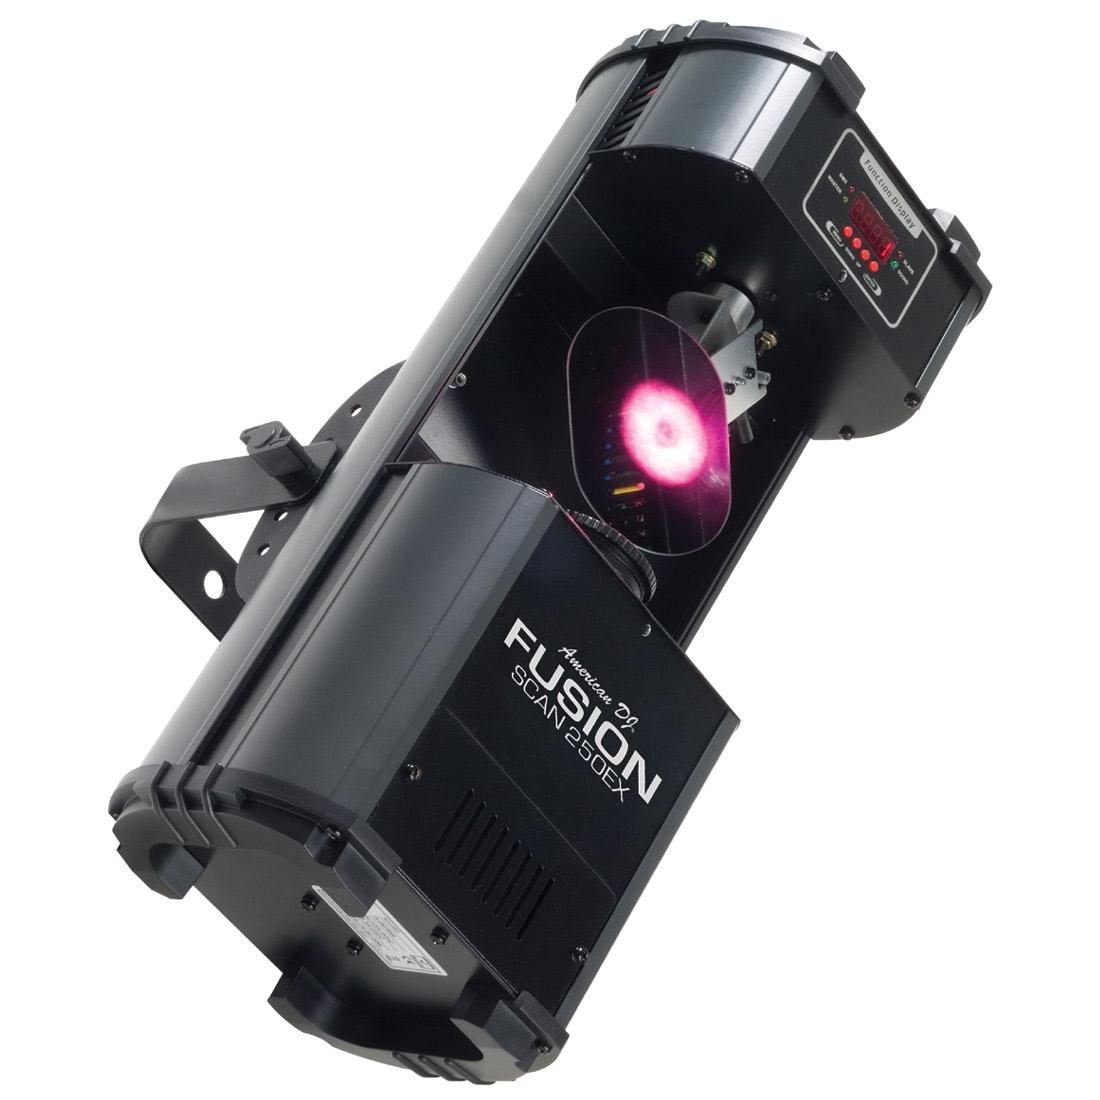 Fusion Scan 250 EX